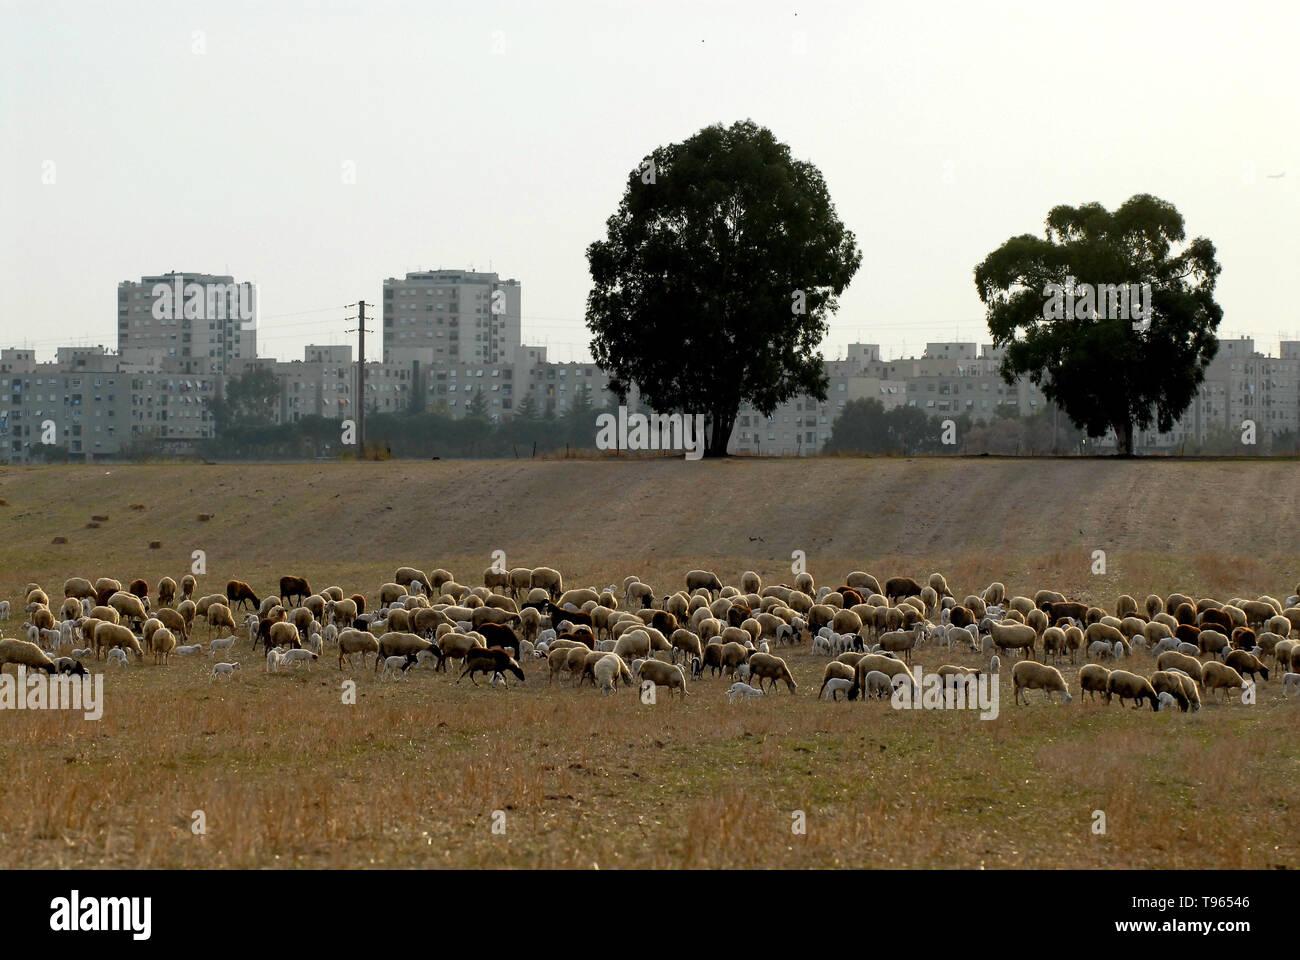 Rome, Tor Bella Monica. Italy: Flocks of sheeps. - Stock Image